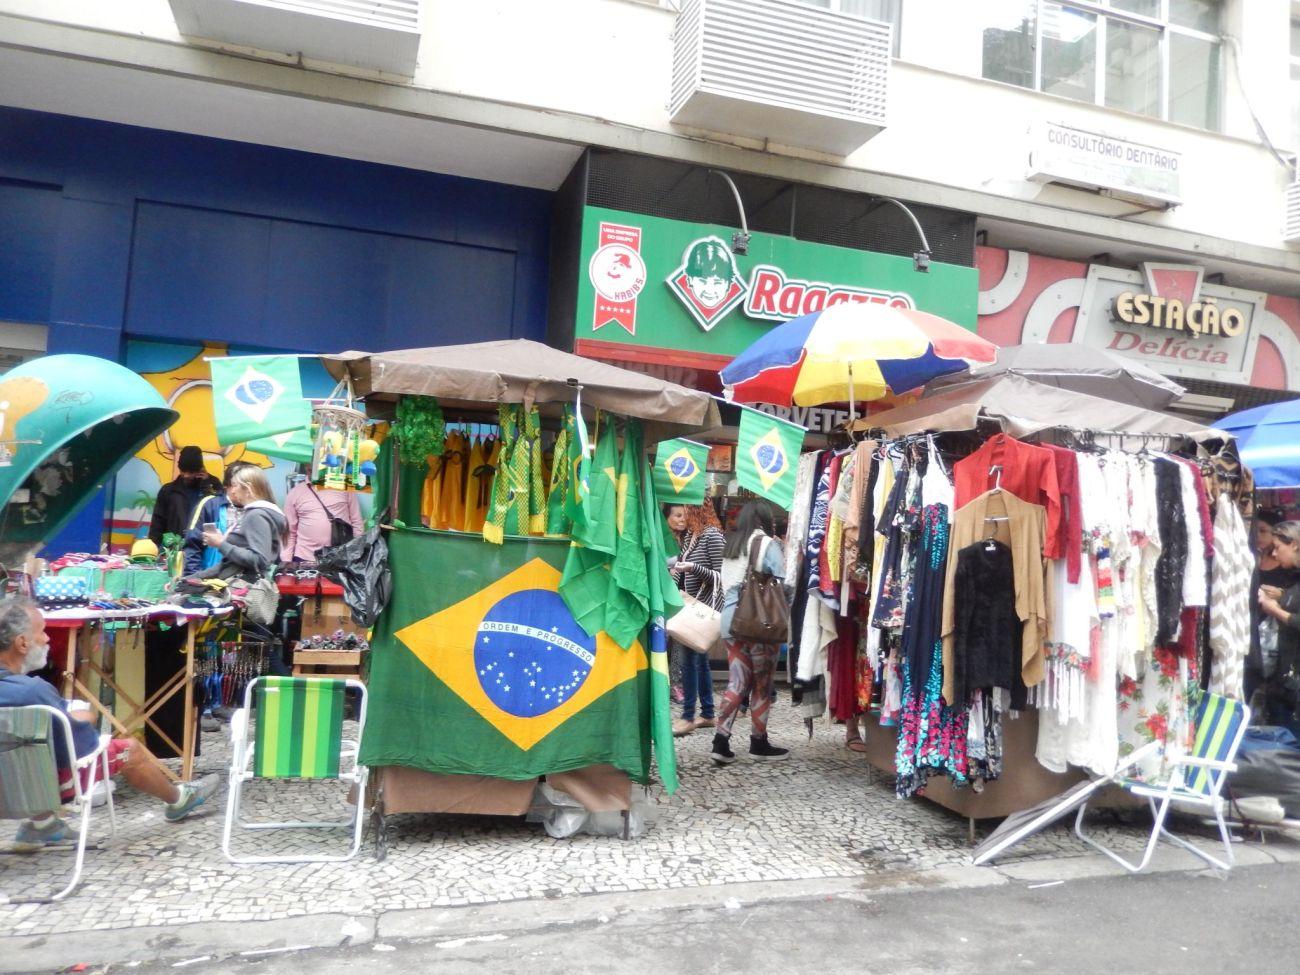 Brazilian World Cup Chant by Footloose Lemon Juice